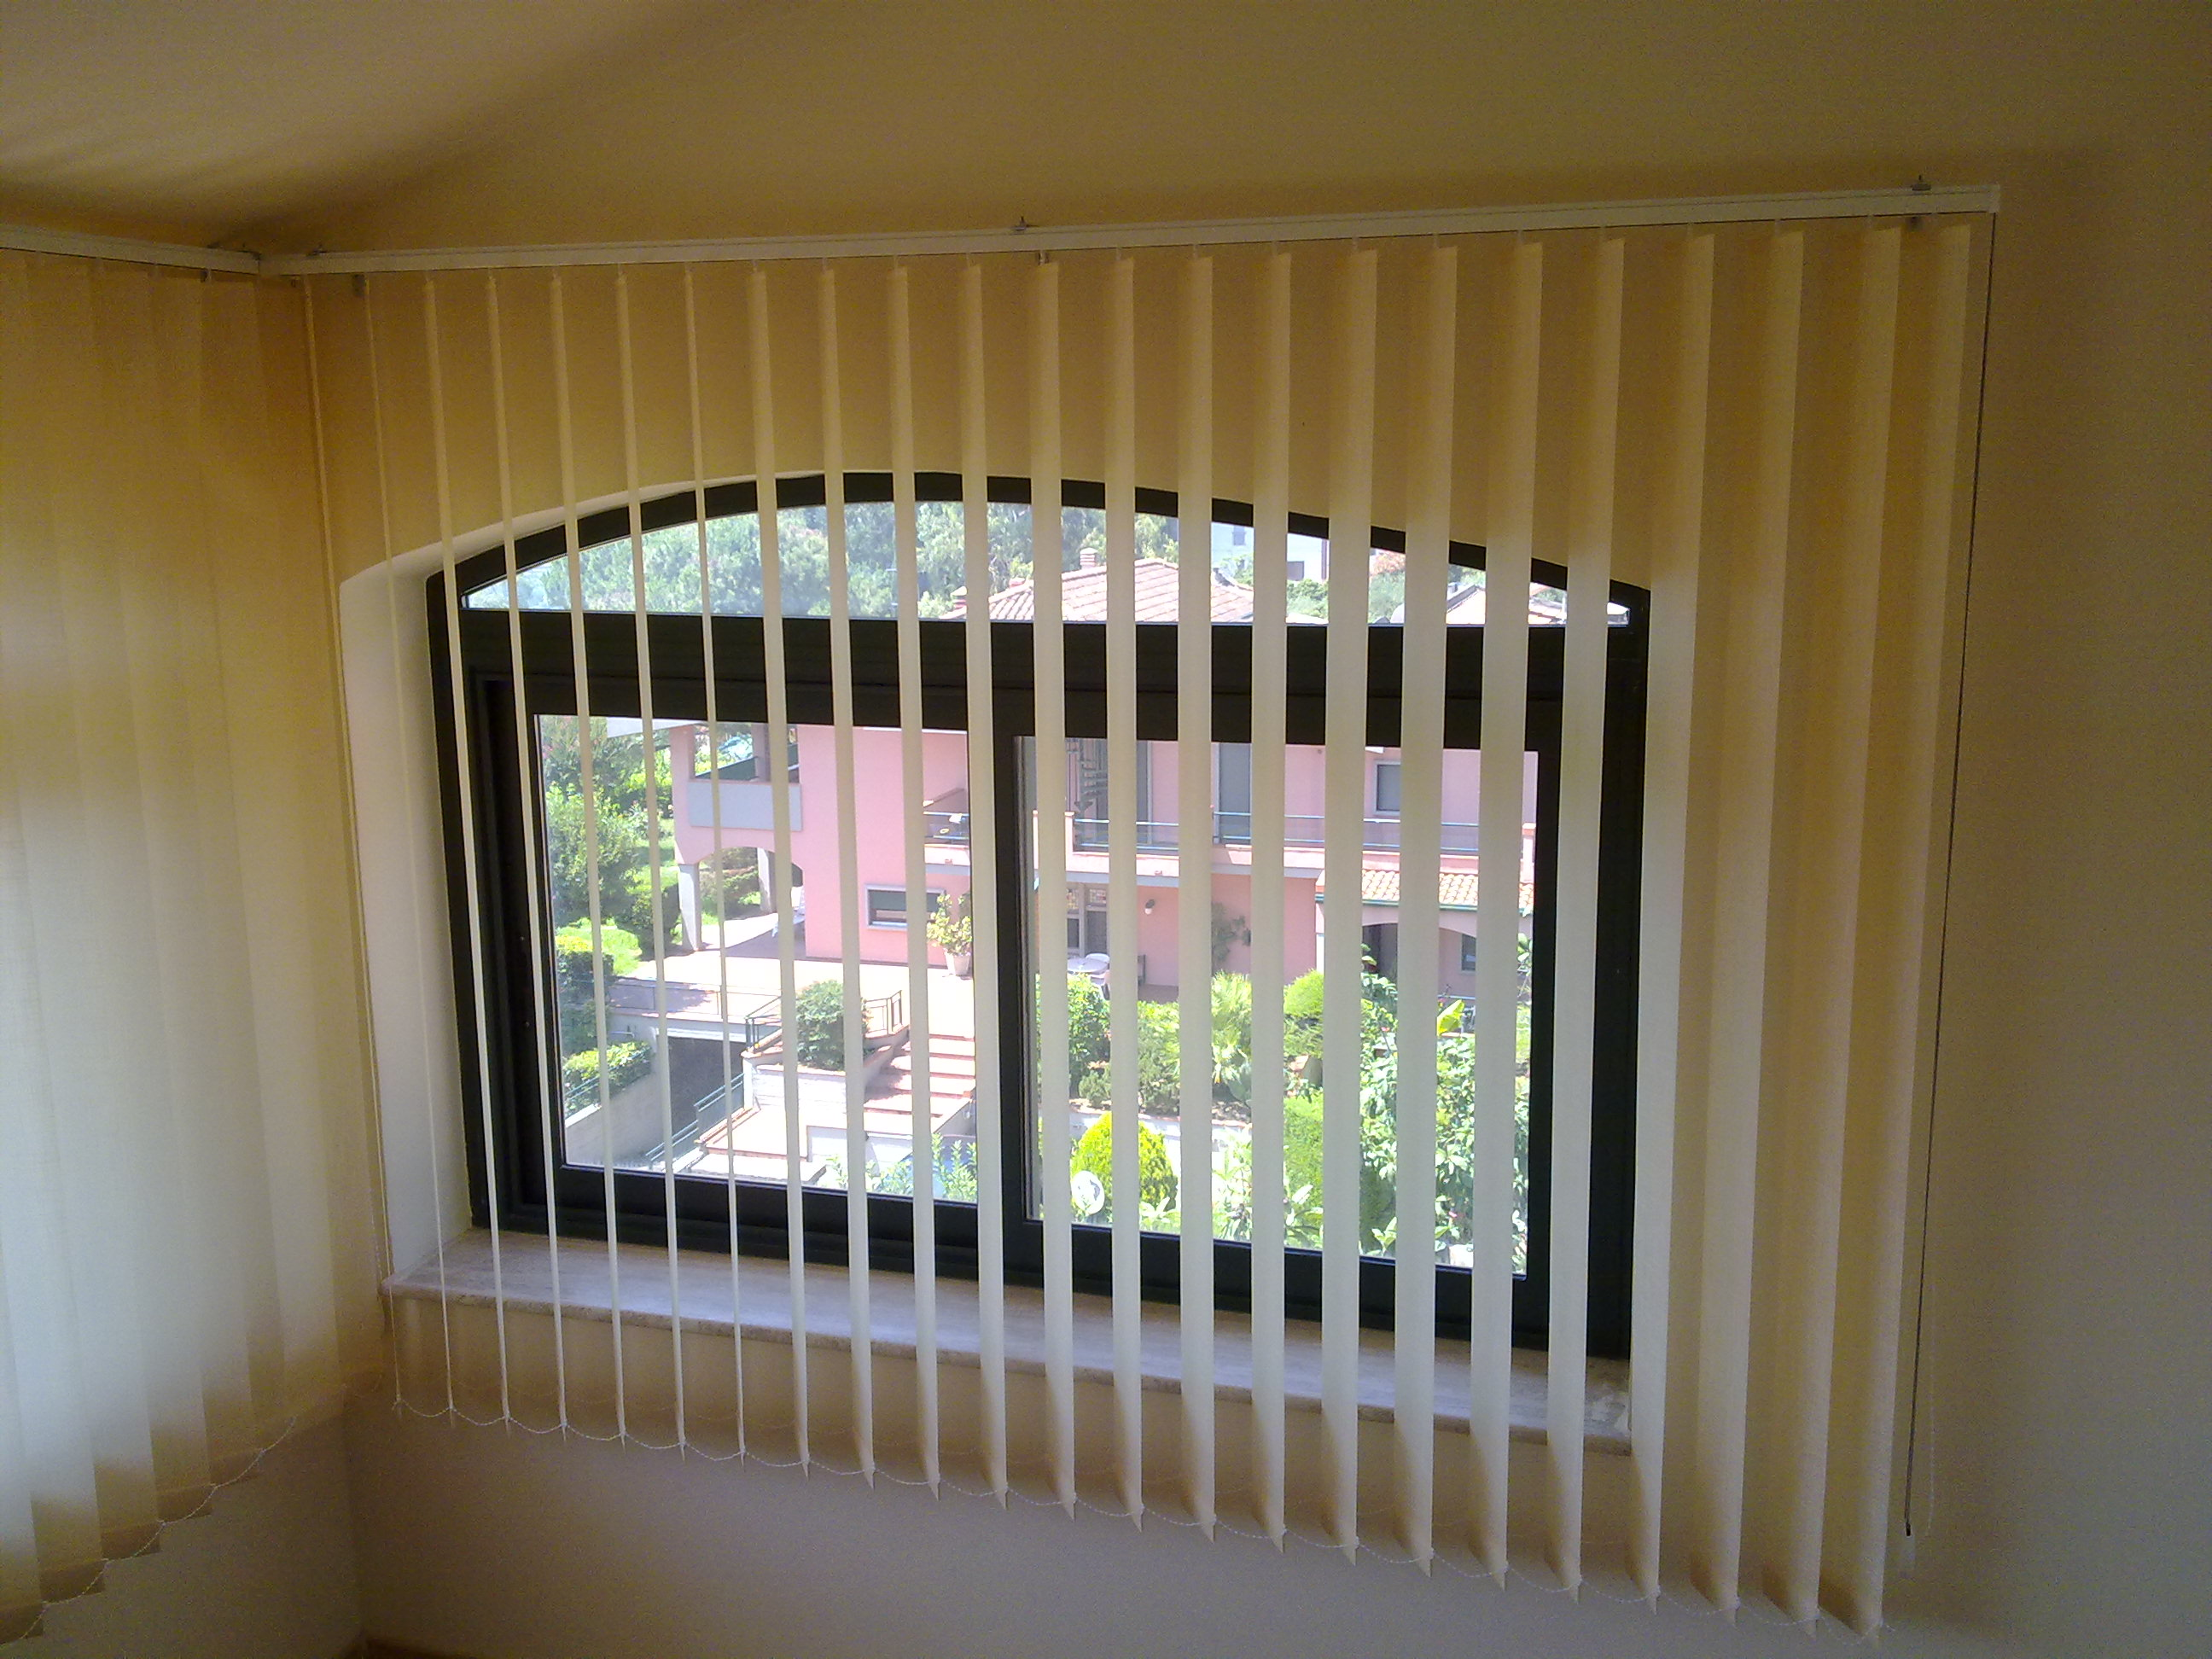 Tenda verticale per interno arredo tendaggi - Tende coprenti per finestre ...